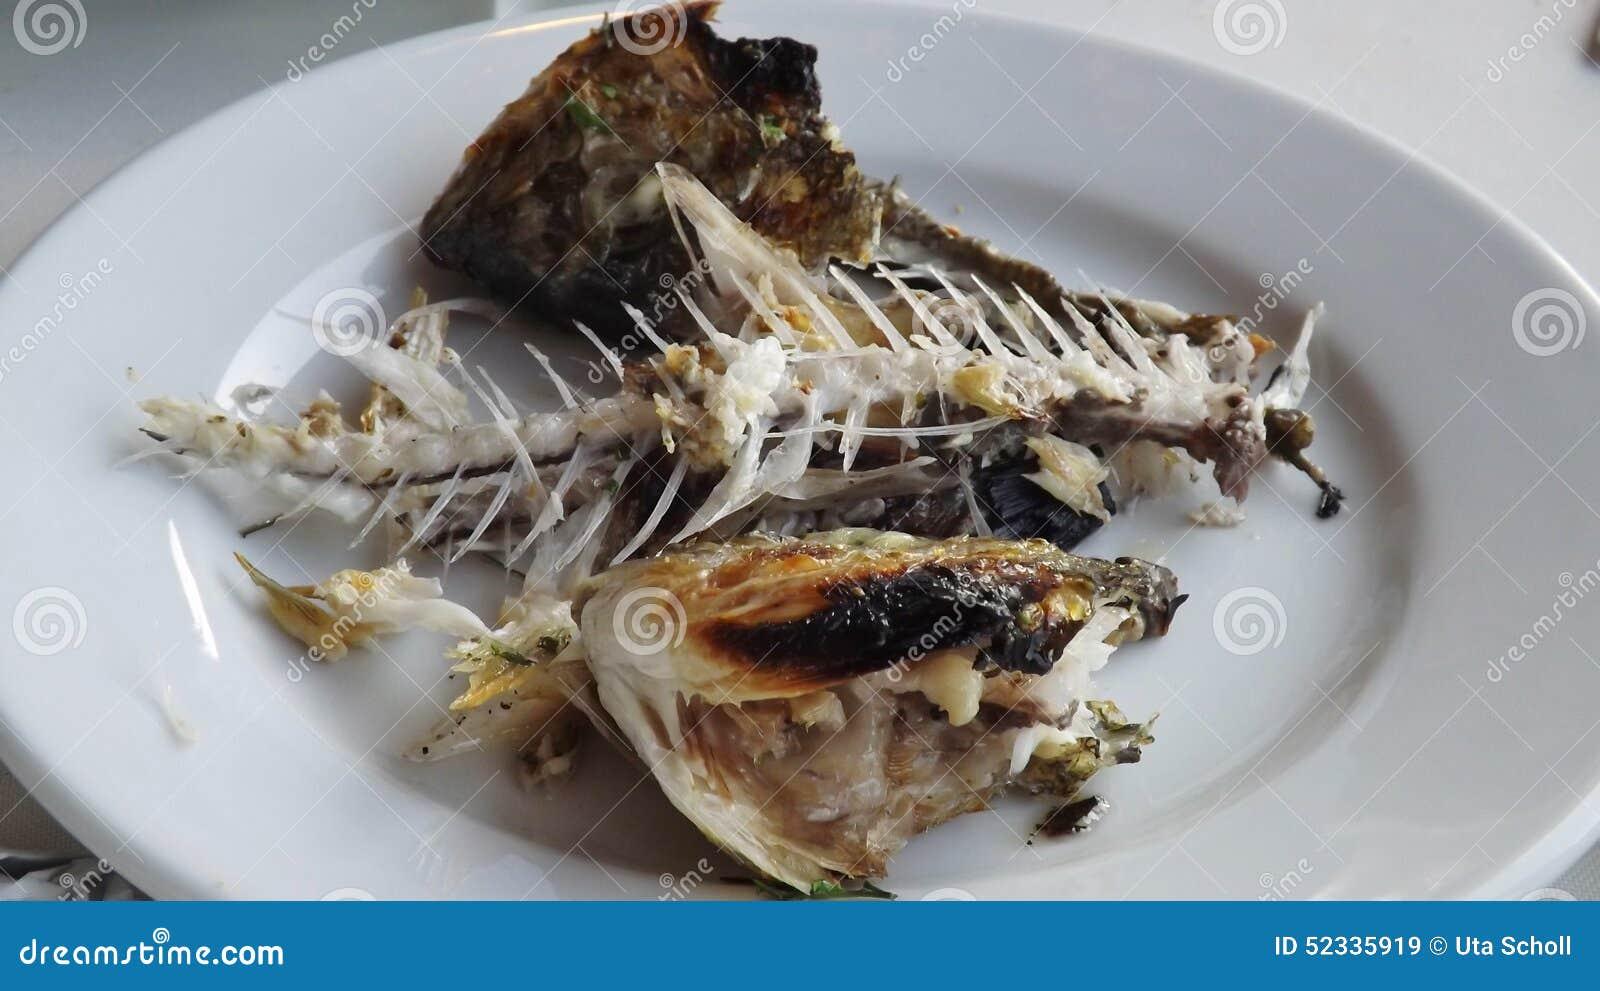 Fish bones of a dorade stock image image of holiday for Fish bones restaurant